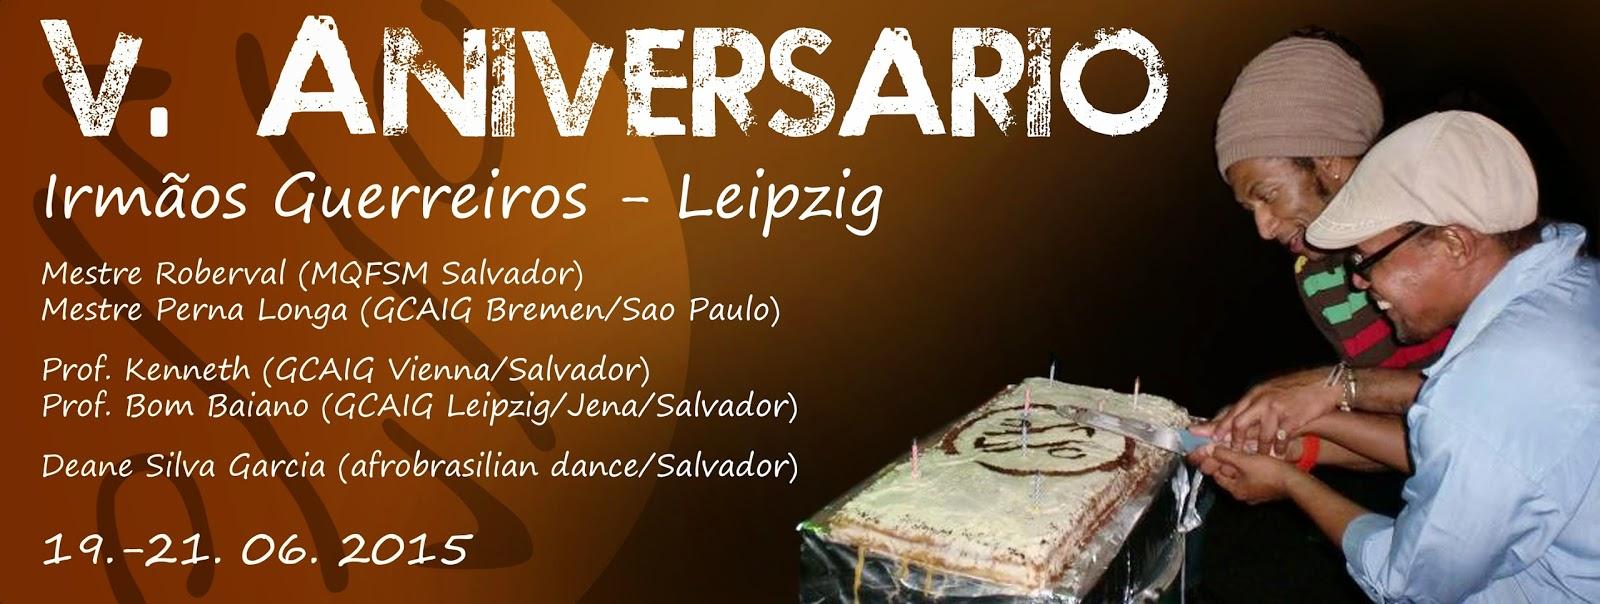 http://capoeira-angola-leipzig.blogspot.de/p/blog-page_26.html